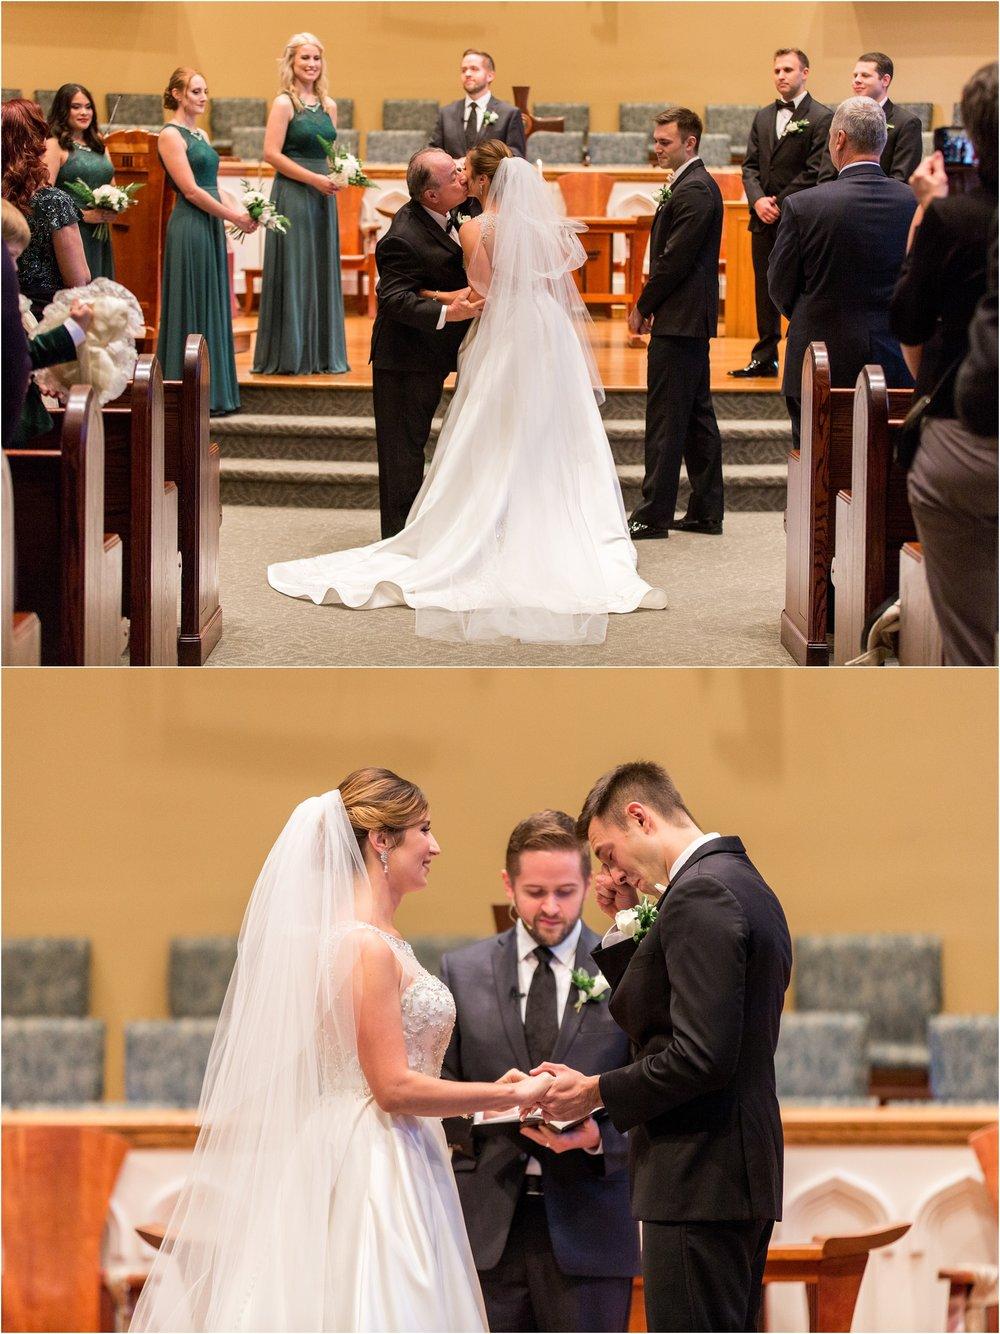 Savannah Eve Photography- Bottiglion-Scope Wedding- Sneak Peek-18.jpg